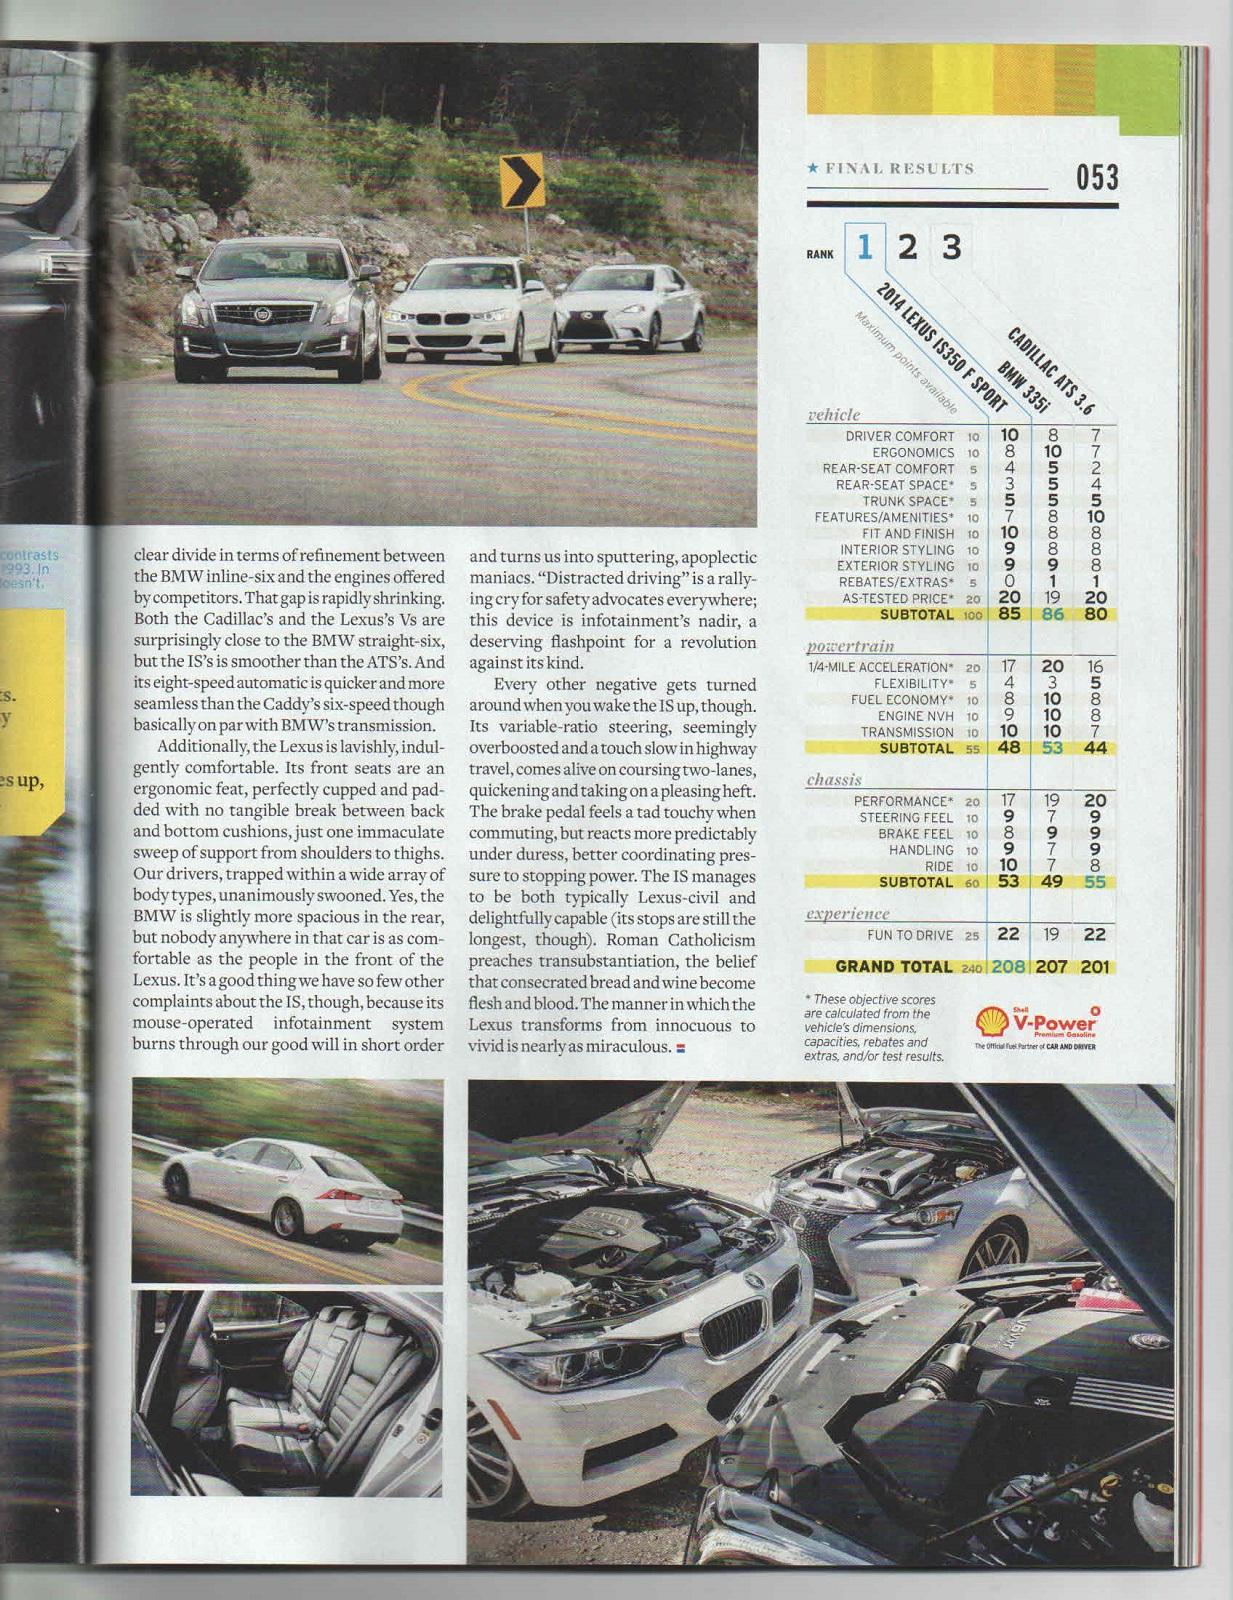 F30 335i M Sport rips 060mph in 46 secs in Jun 13 Car  Driver